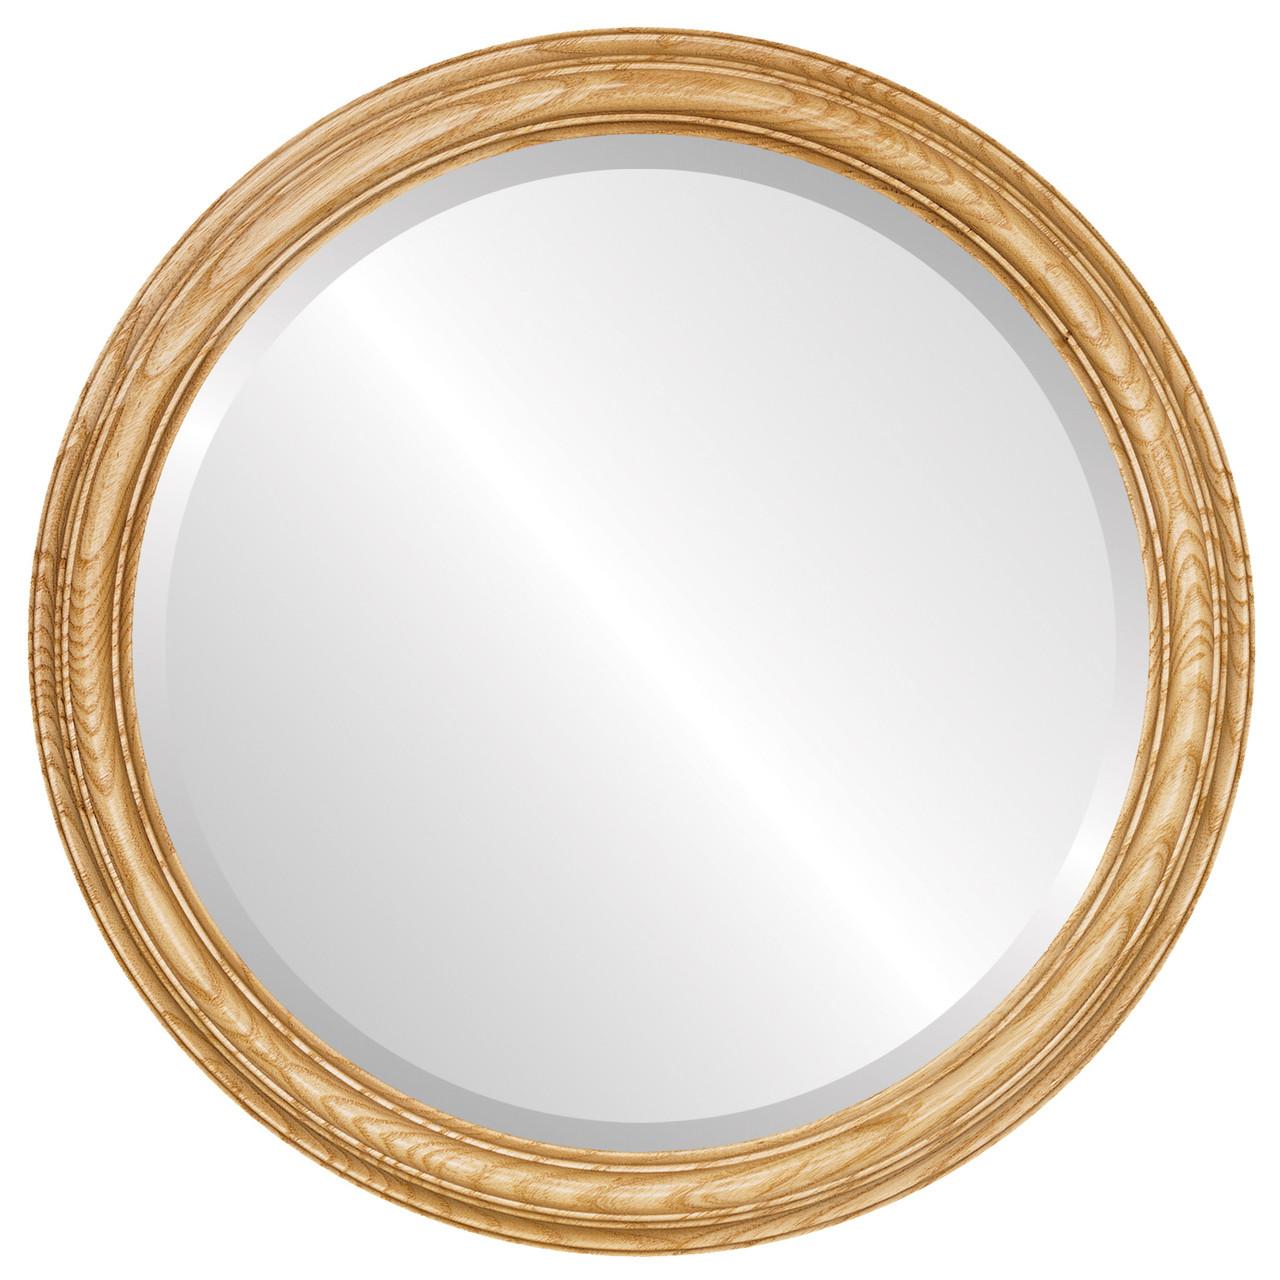 Round Framed Mirror #300 Melbourne Honey Oak Finish